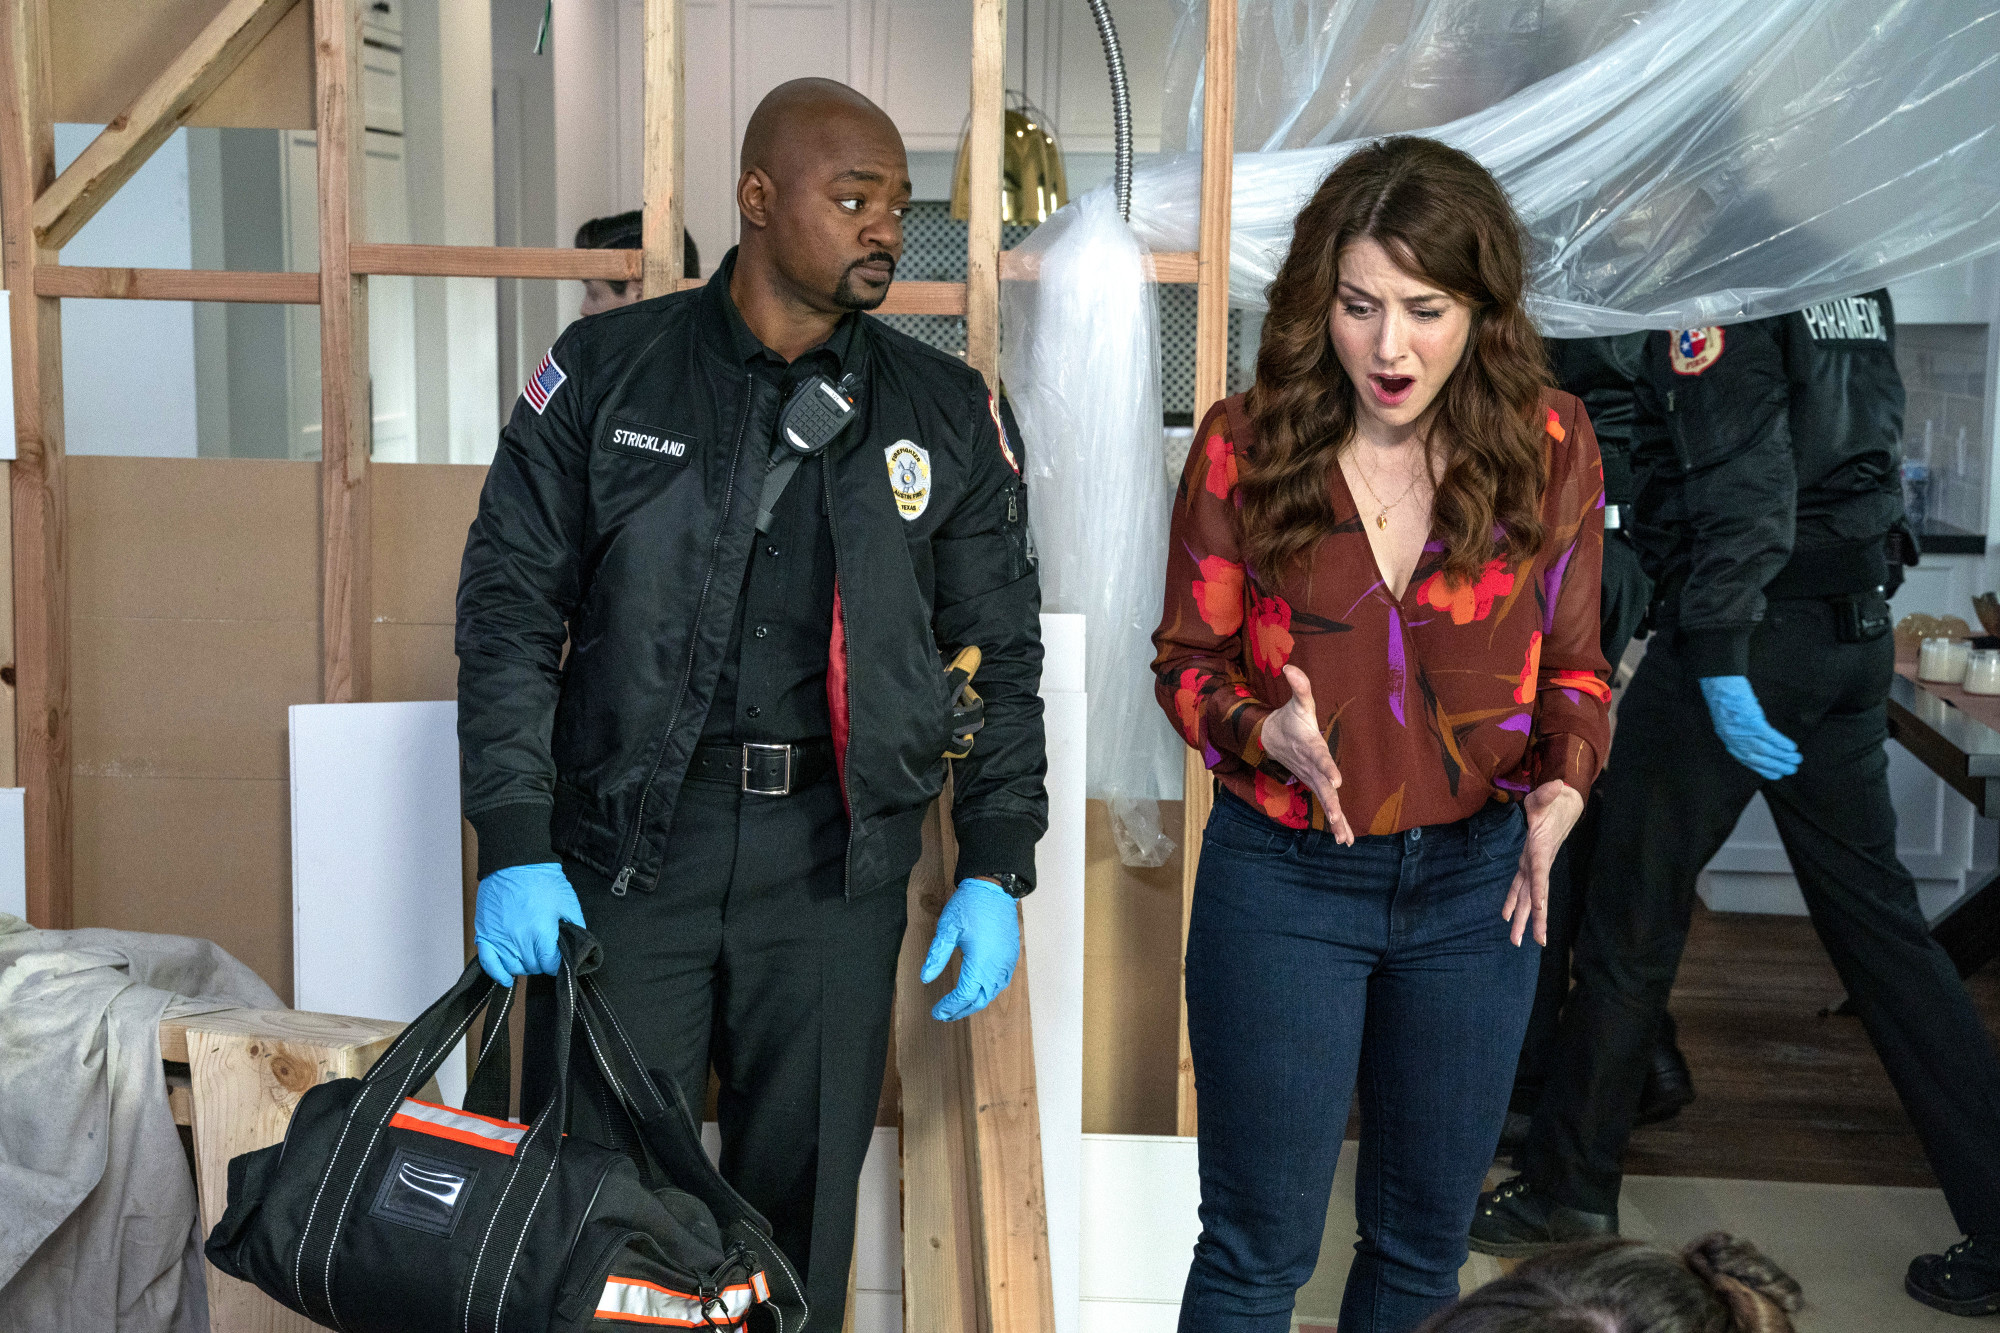 "9-1-1: LONE STAR: L-R: Brian Michael Smith and guest star Erin Karpluk in the ""Bum Steer"" episode of 9-1-1: LONE STAR airing Monday, Feb. 24 (8:00-9:01 PM ET/PT) on FOX. ©2020 Fox Media LLC. CR: Jack Zeman/FOX."